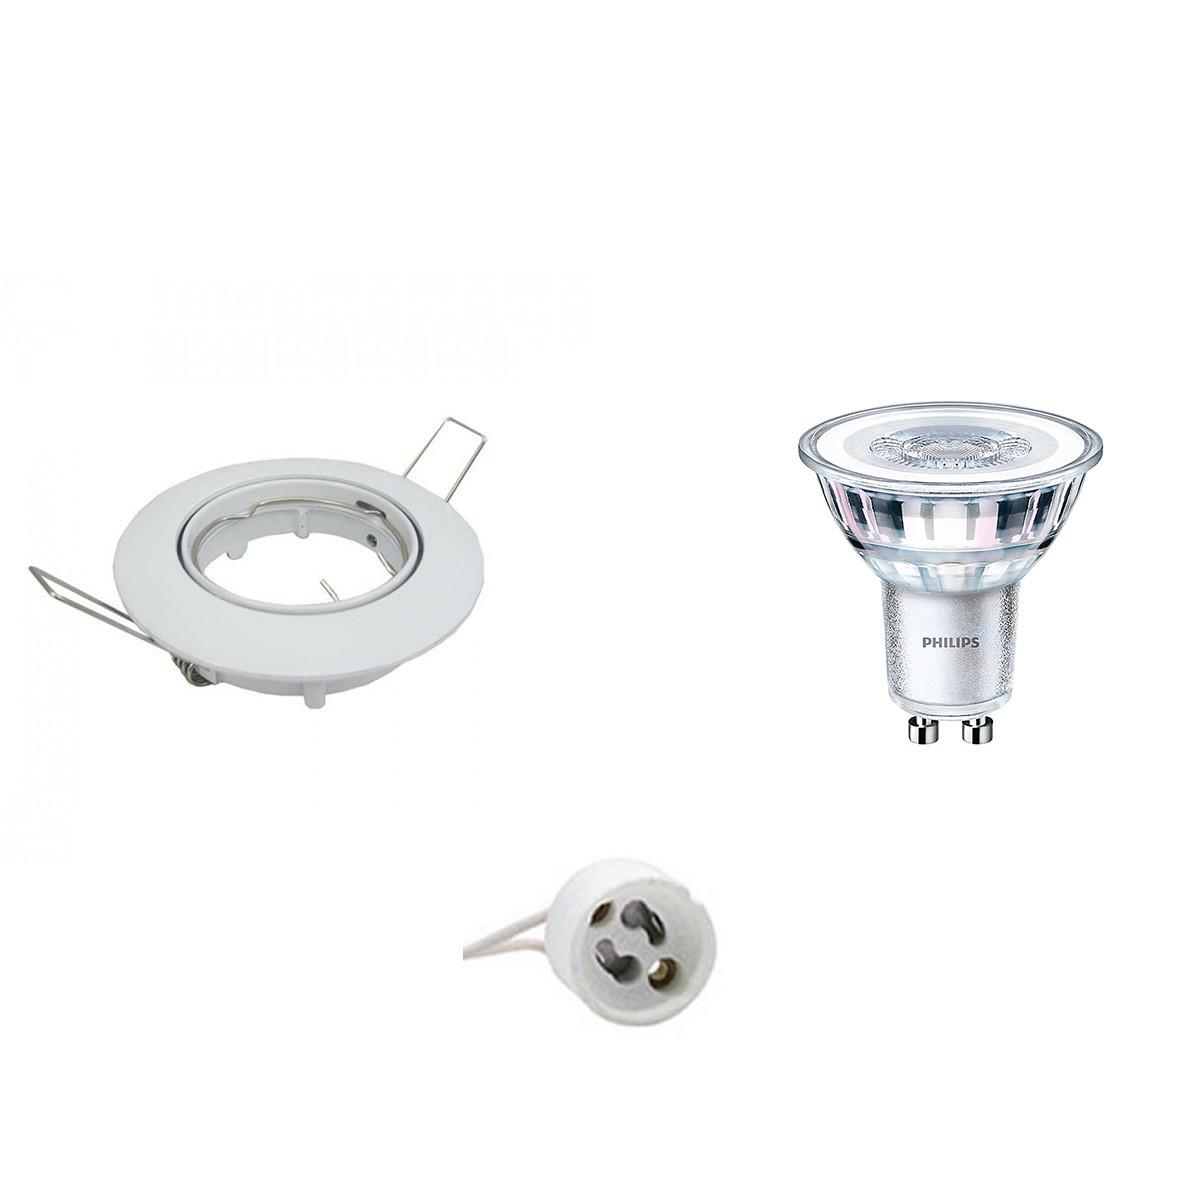 PHILIPS - LED Spot Set - CorePro 840 36D - GU10 Fitting - Dimbaar - Inbouw Rond - Glans Wit - 4W - N